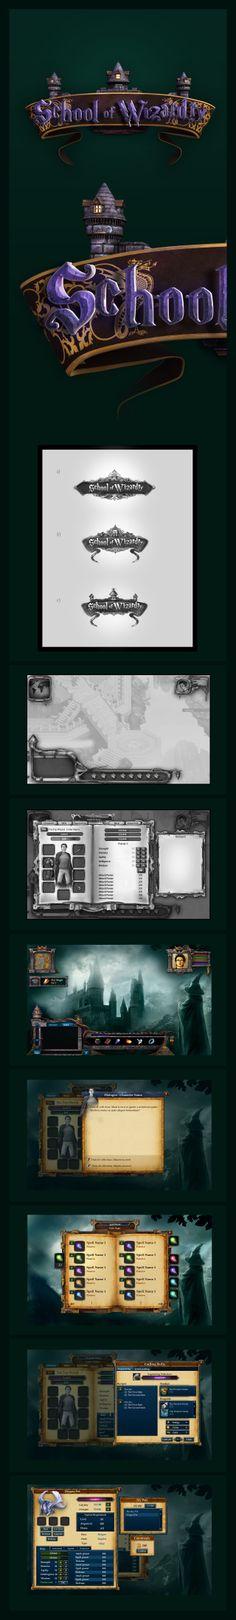 School of Wizardry GUI Game Design by karsten on deviantART